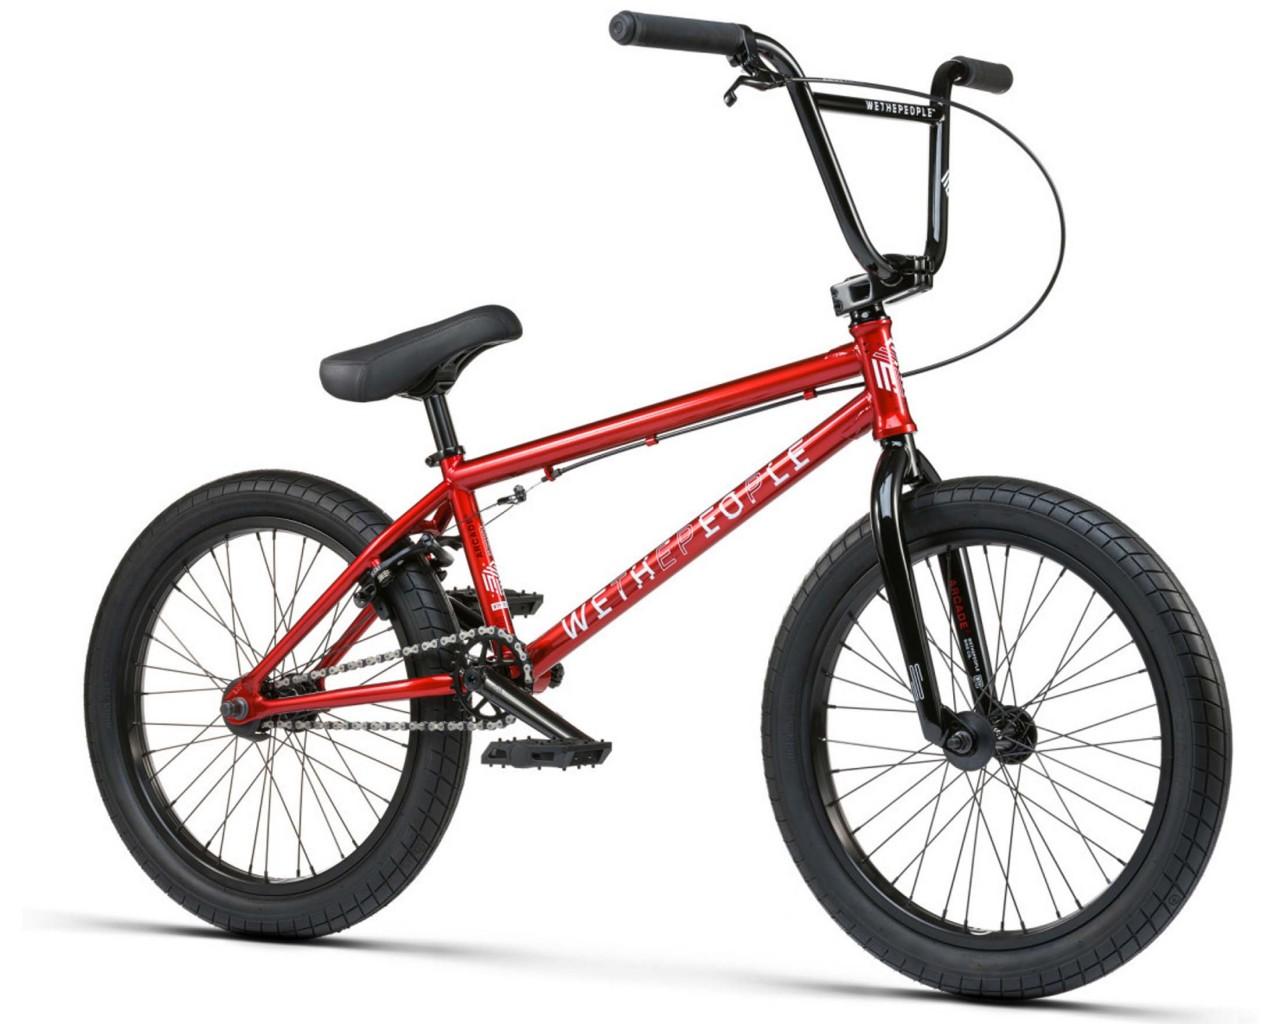 Wethepeople Arcade 20 inch - BMX Bike 2021   candy red